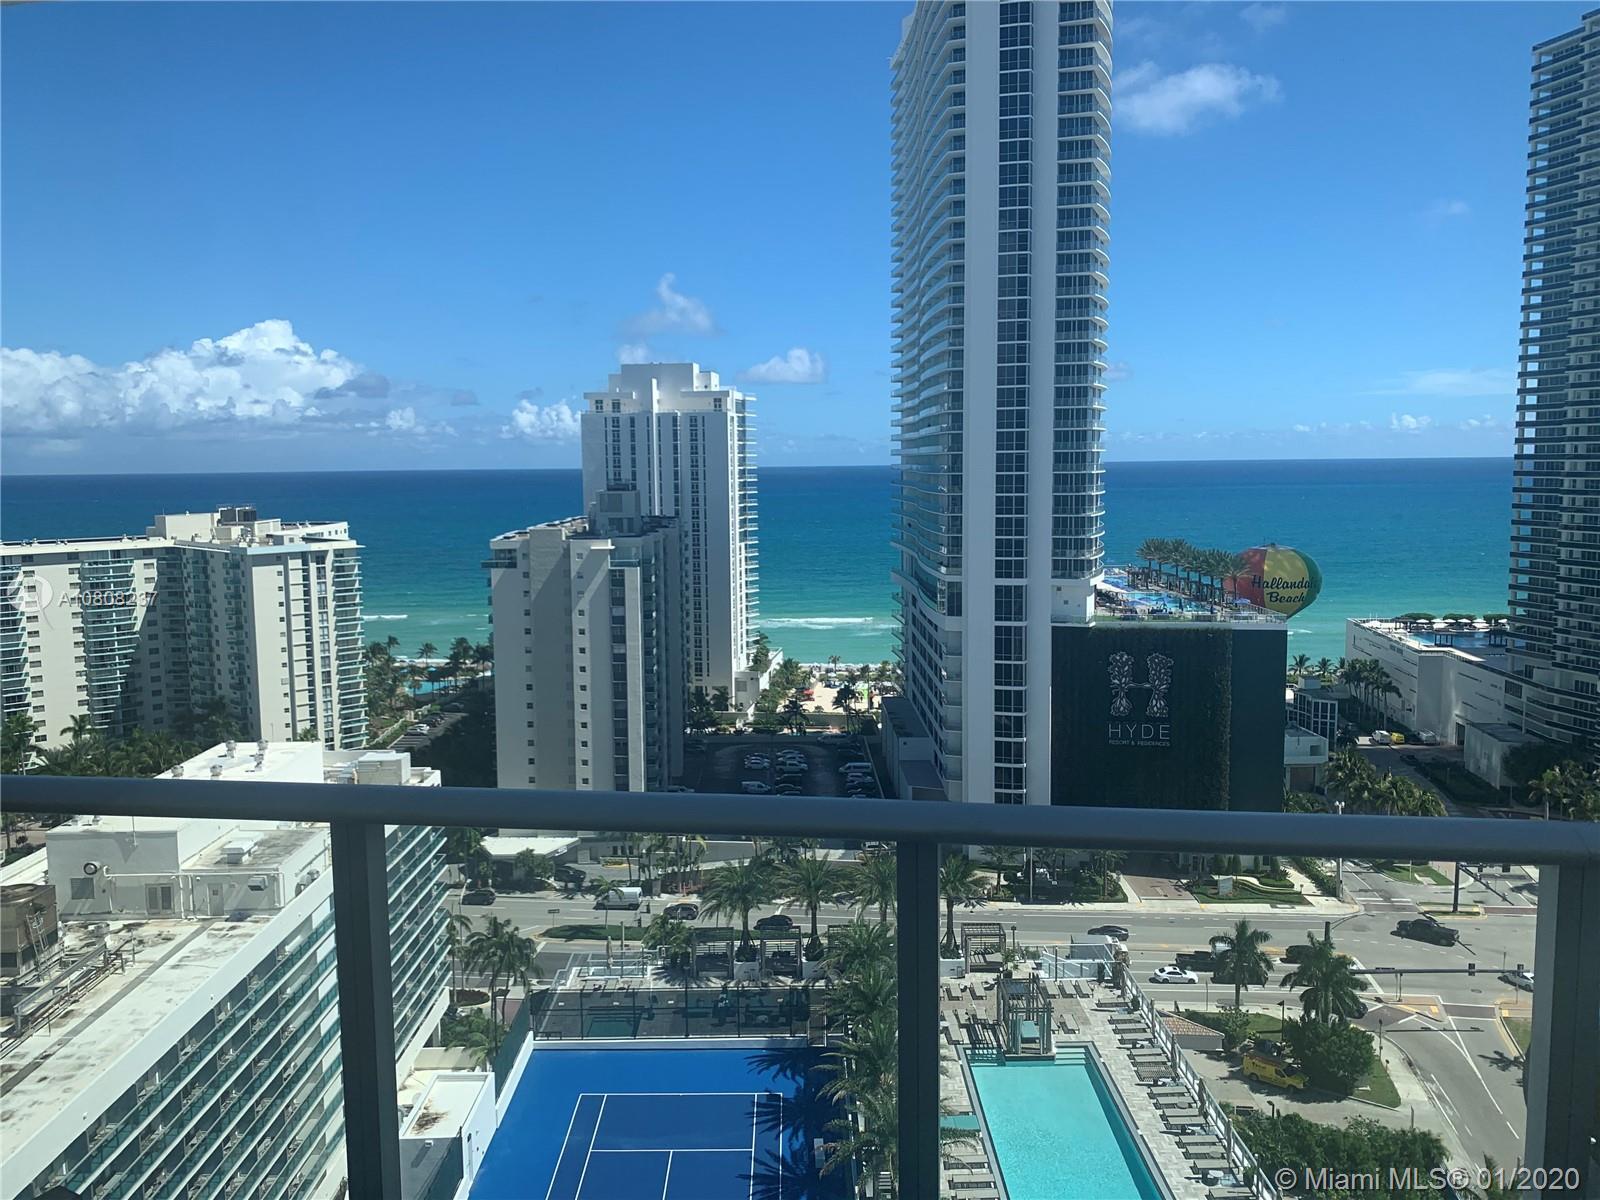 4010 S Ocean # 1705, Hollywood, Florida 33019, 2 Bedrooms Bedrooms, ,2 BathroomsBathrooms,Residential,For Sale,4010 S Ocean # 1705,A10808237